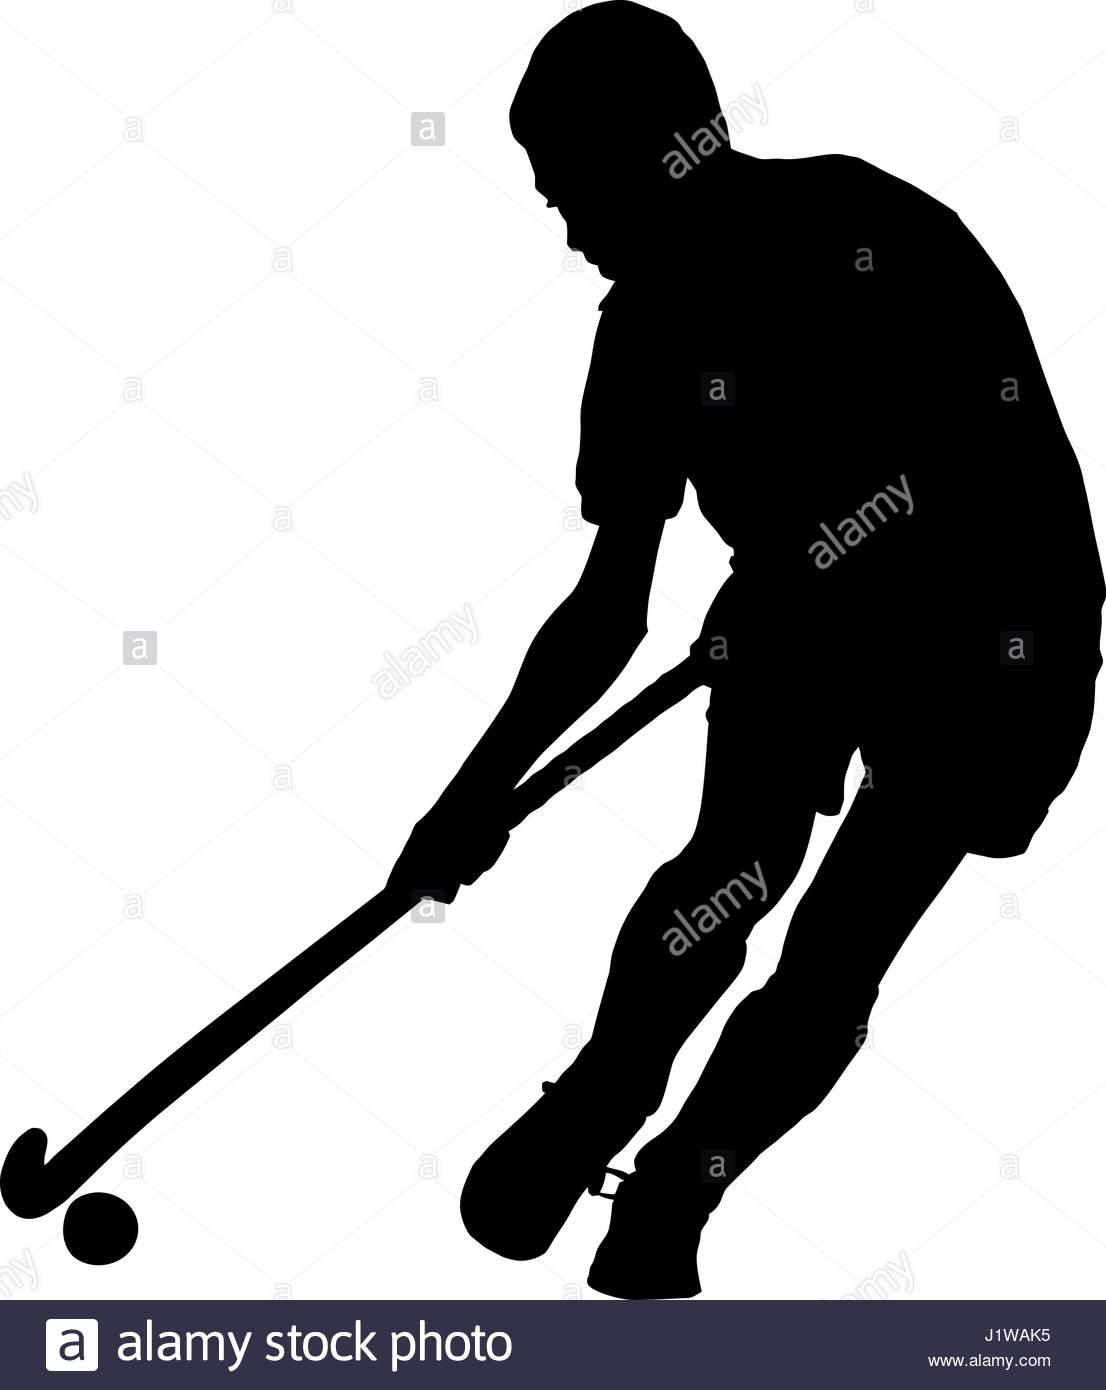 1106x1390 Black On White Silhouette Of School Boy Hockey Player Running